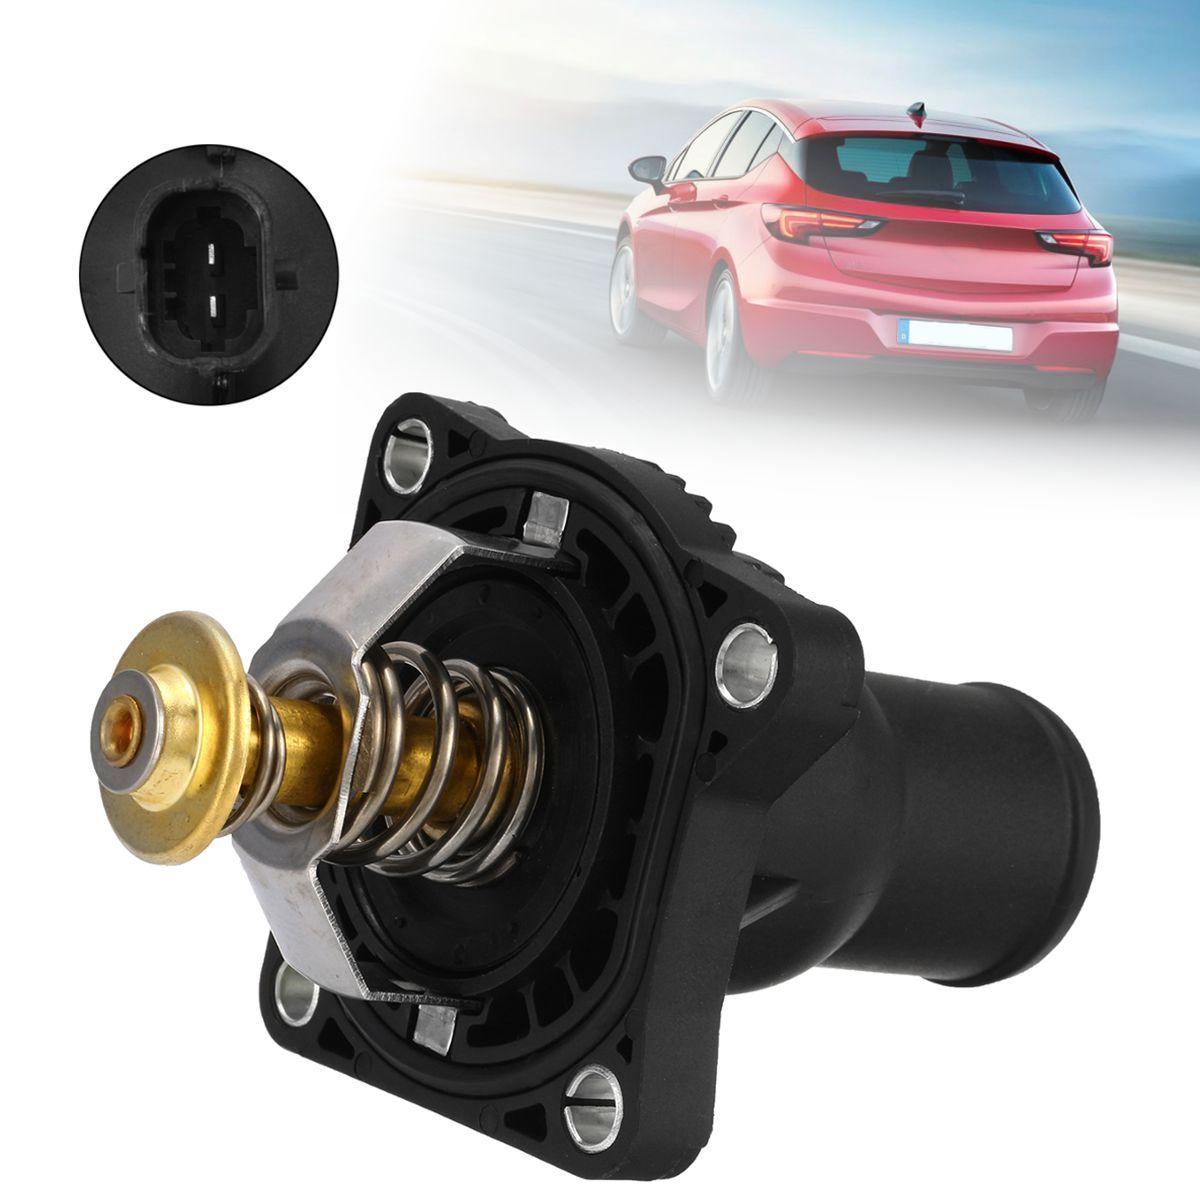 #55564891 #55587349 Thermostat With Housing For Chevrolet/Opel/Vauxhall Aveo Astra J Insignia Mokka Zafira C GTC 2009 2010 2011